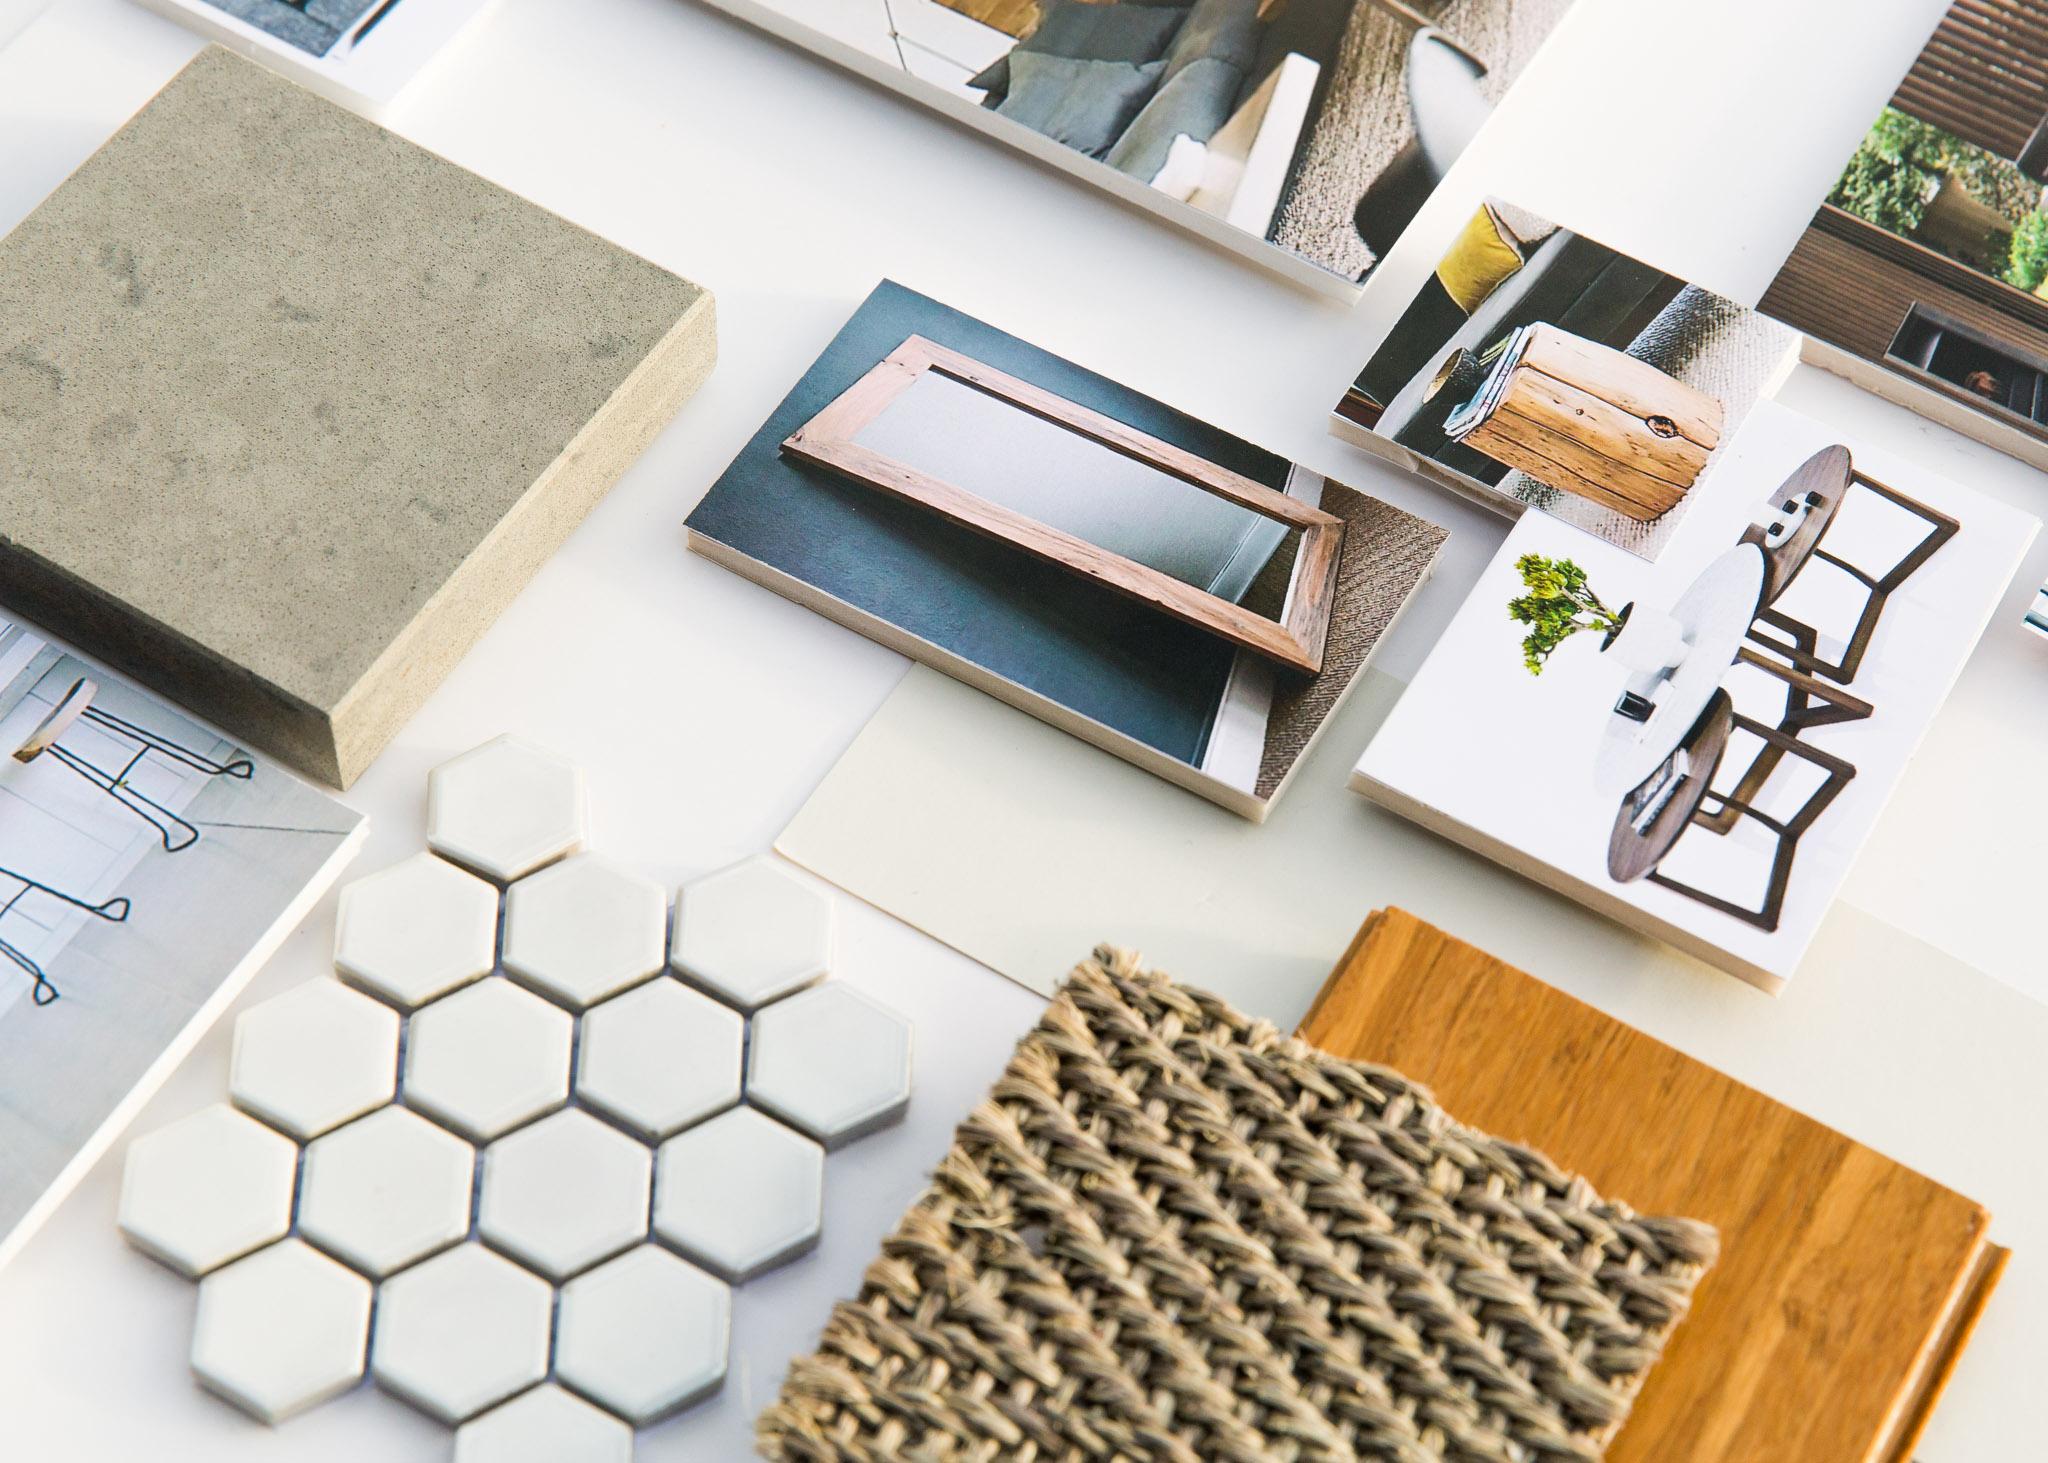 Interior Designers Near Me: Checklist & Free Contractor Quotes 2021